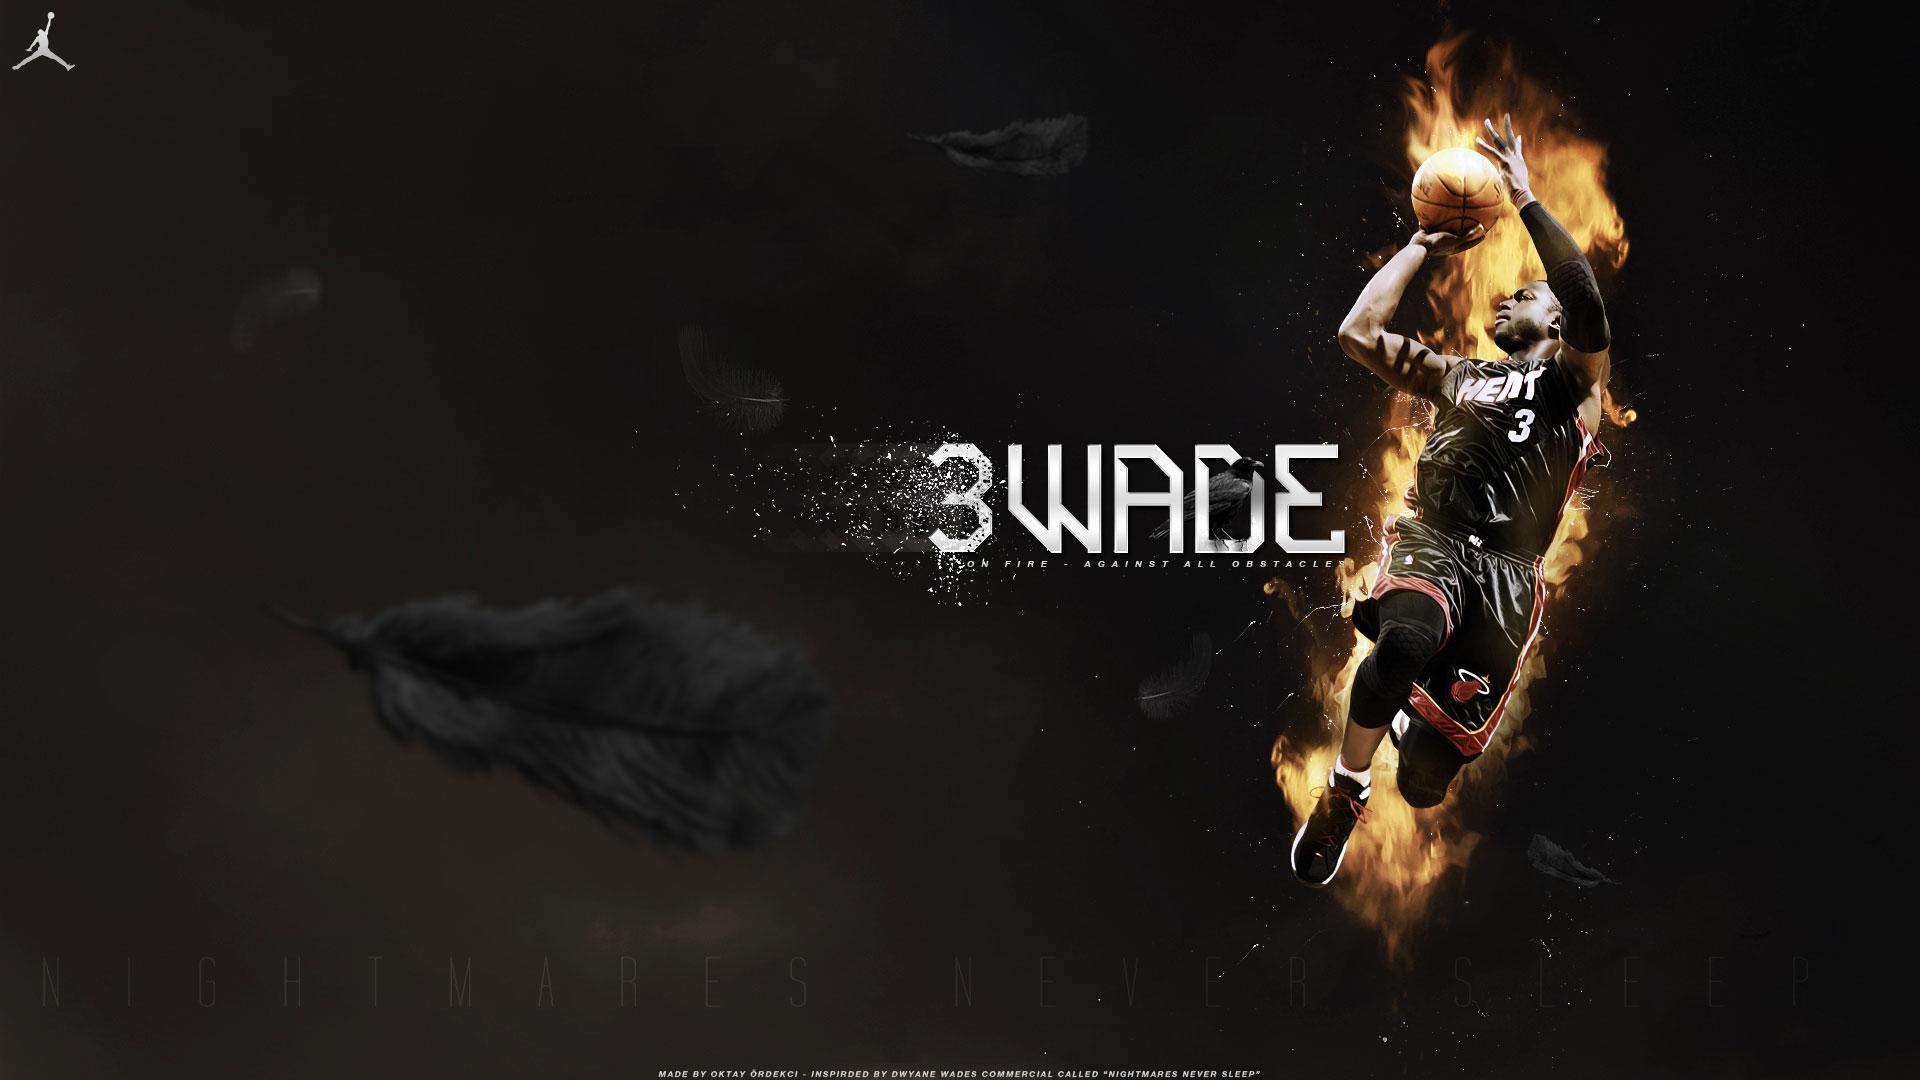 Next goes new wide screen wallpaper of Dwyane Wade, 1920x1080 pixels ...